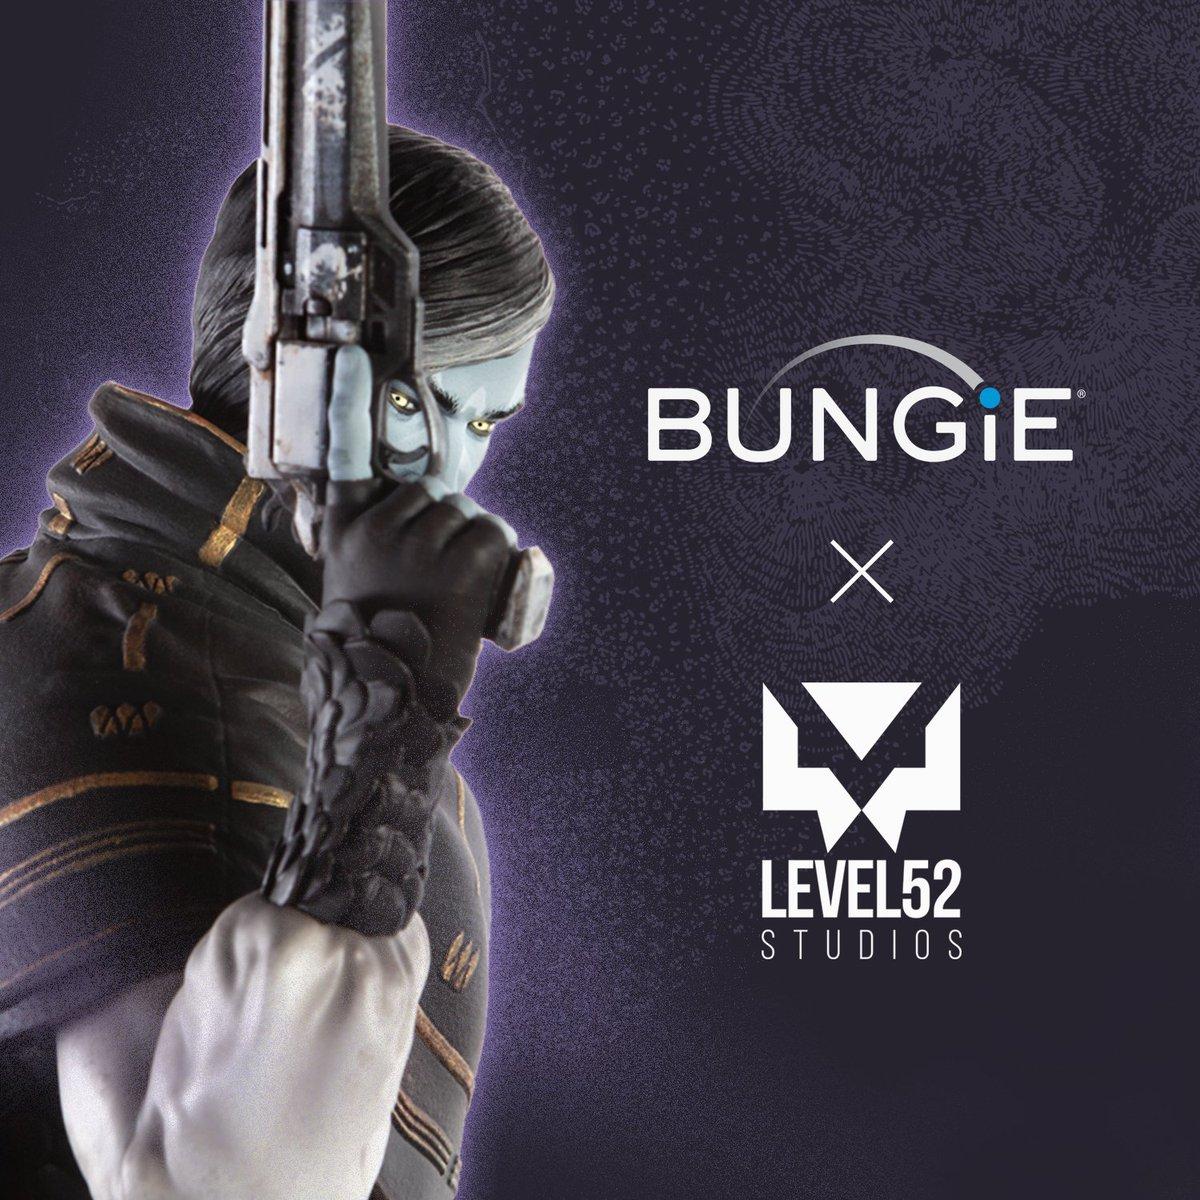 8e209a64a31 ... with  Bungie to create Destiny Legends